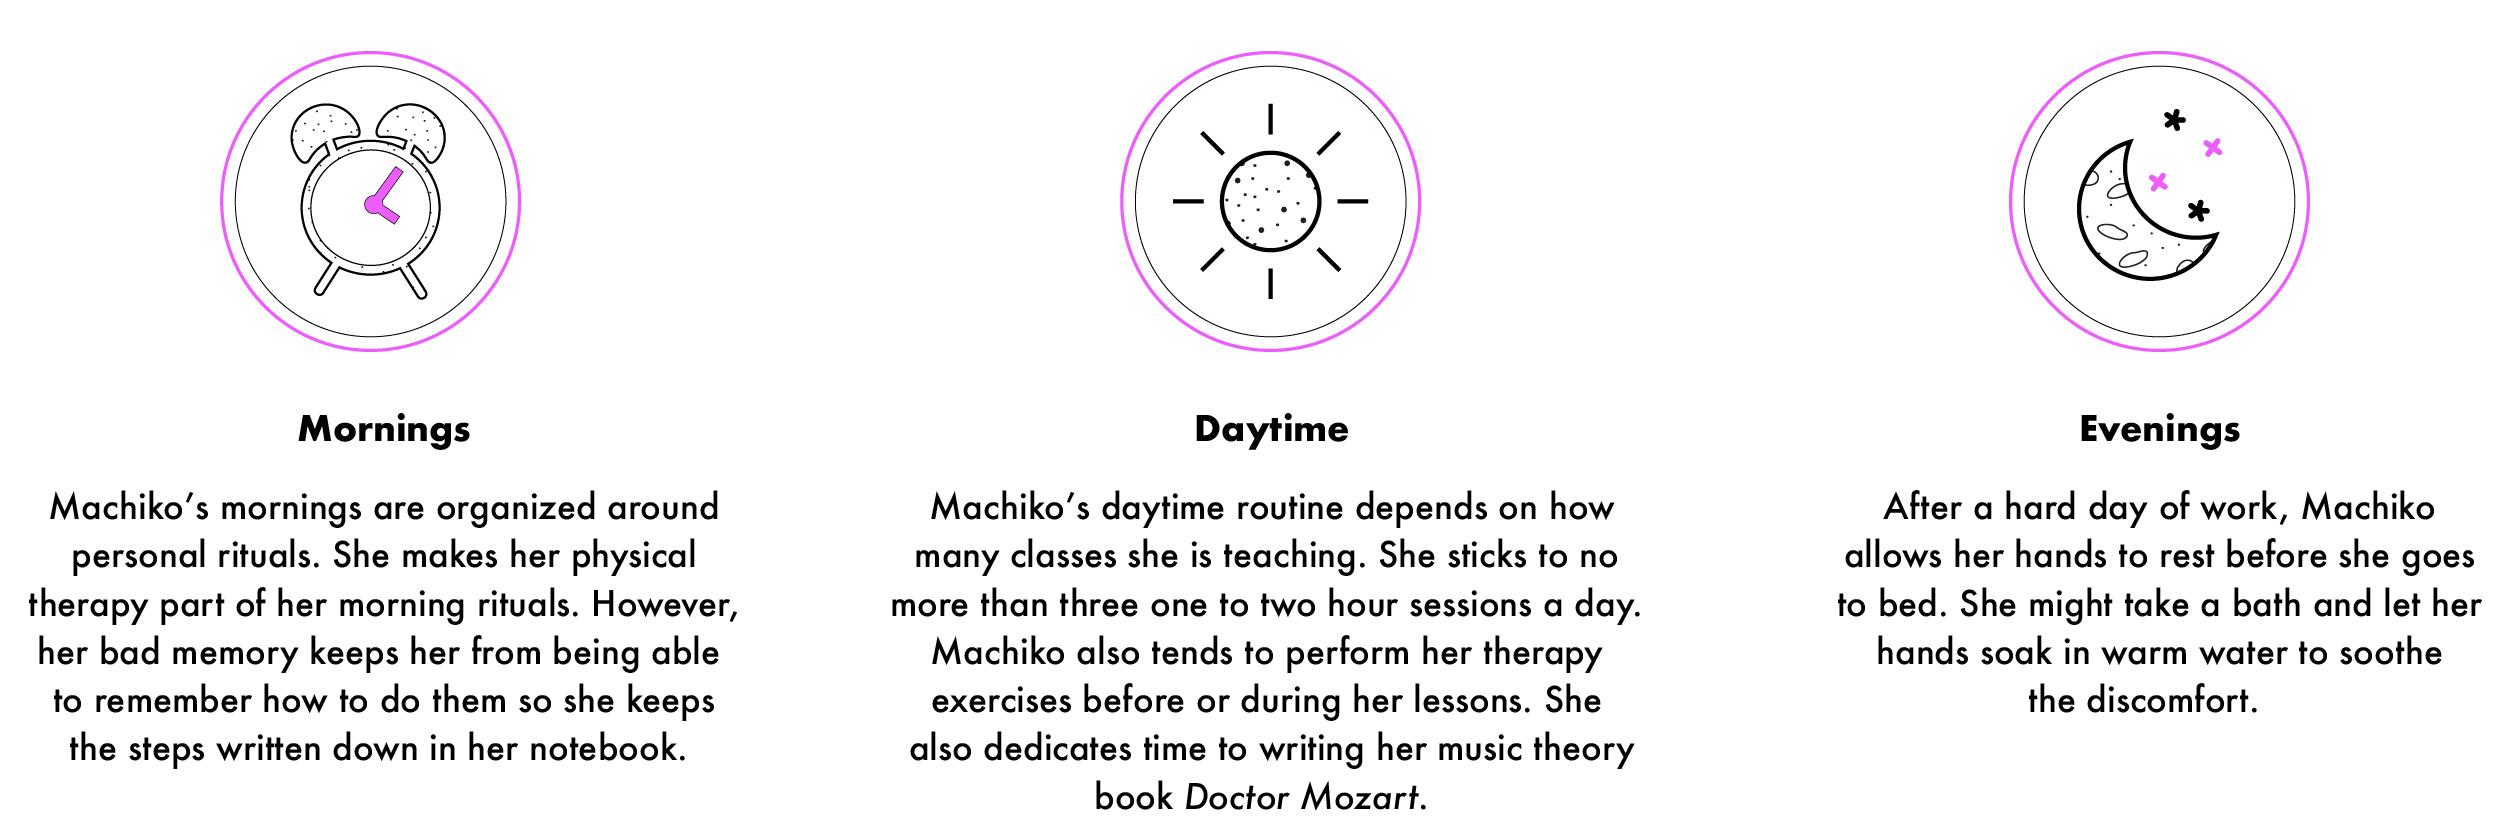 Daily Routine-02.jpg